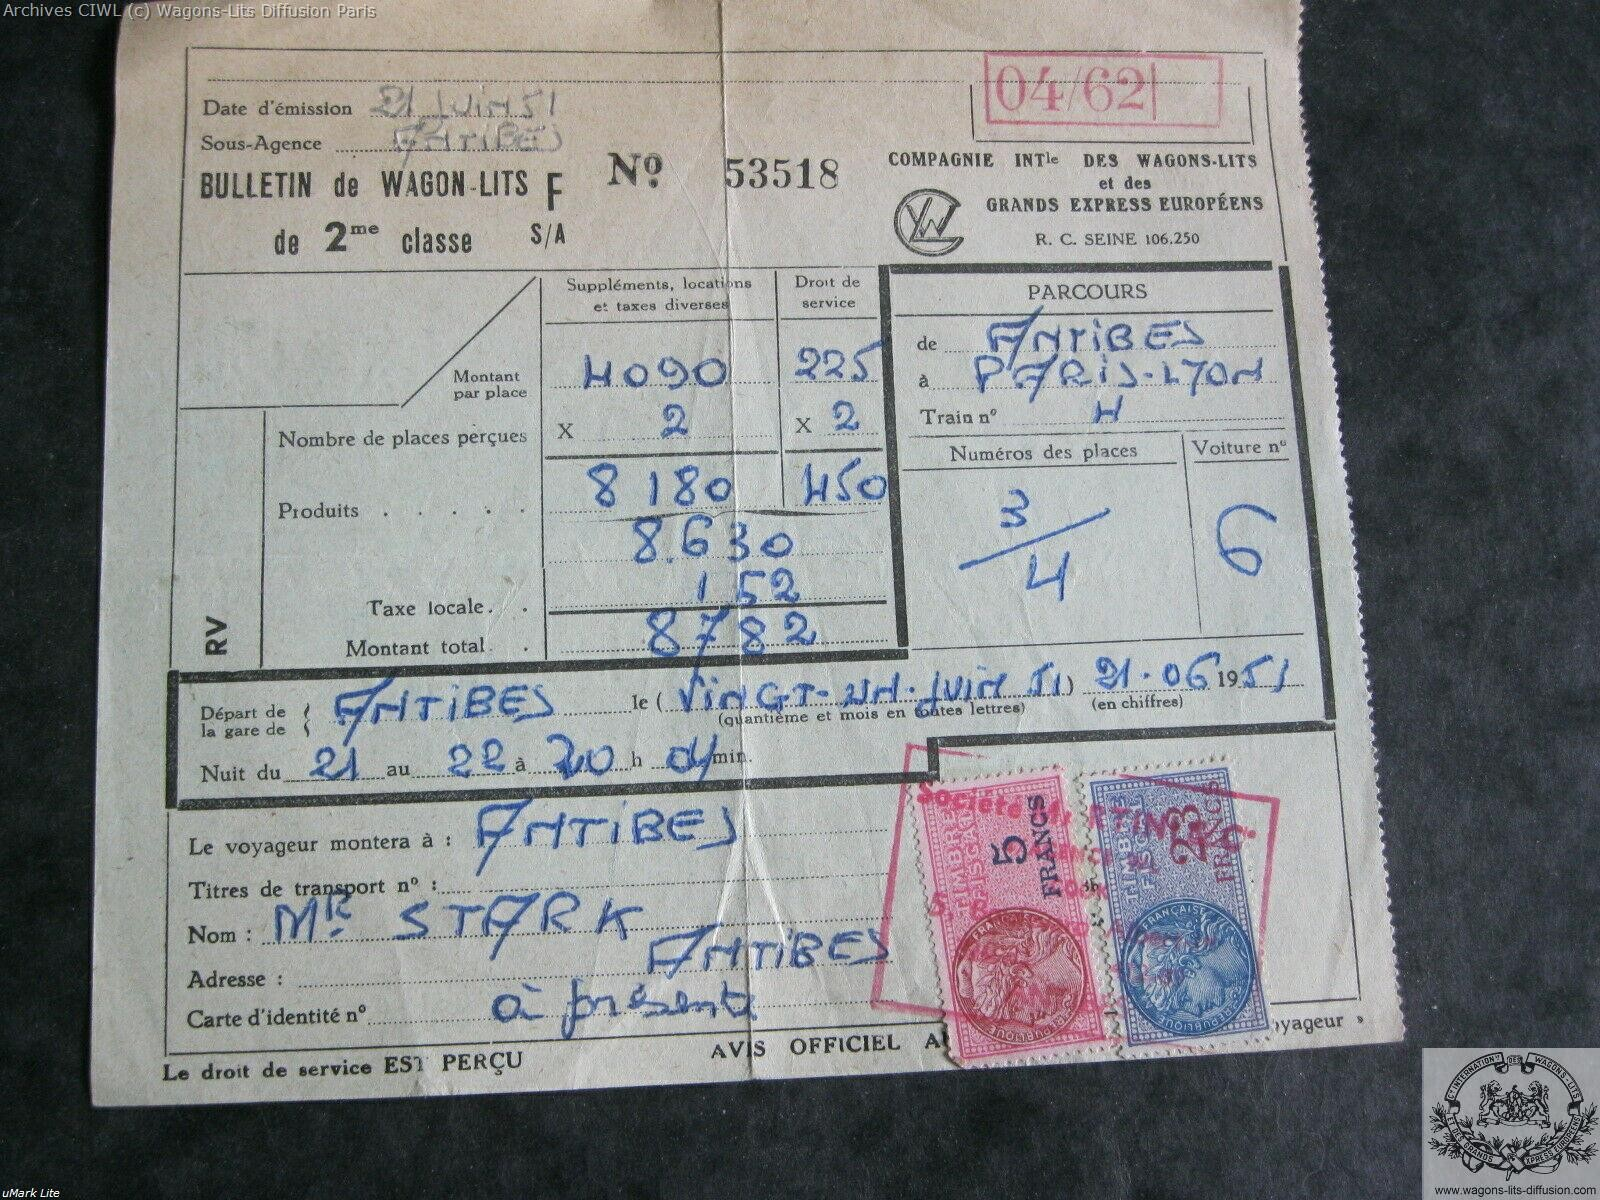 Wl billet ciwl paris antibes train bleu 1951